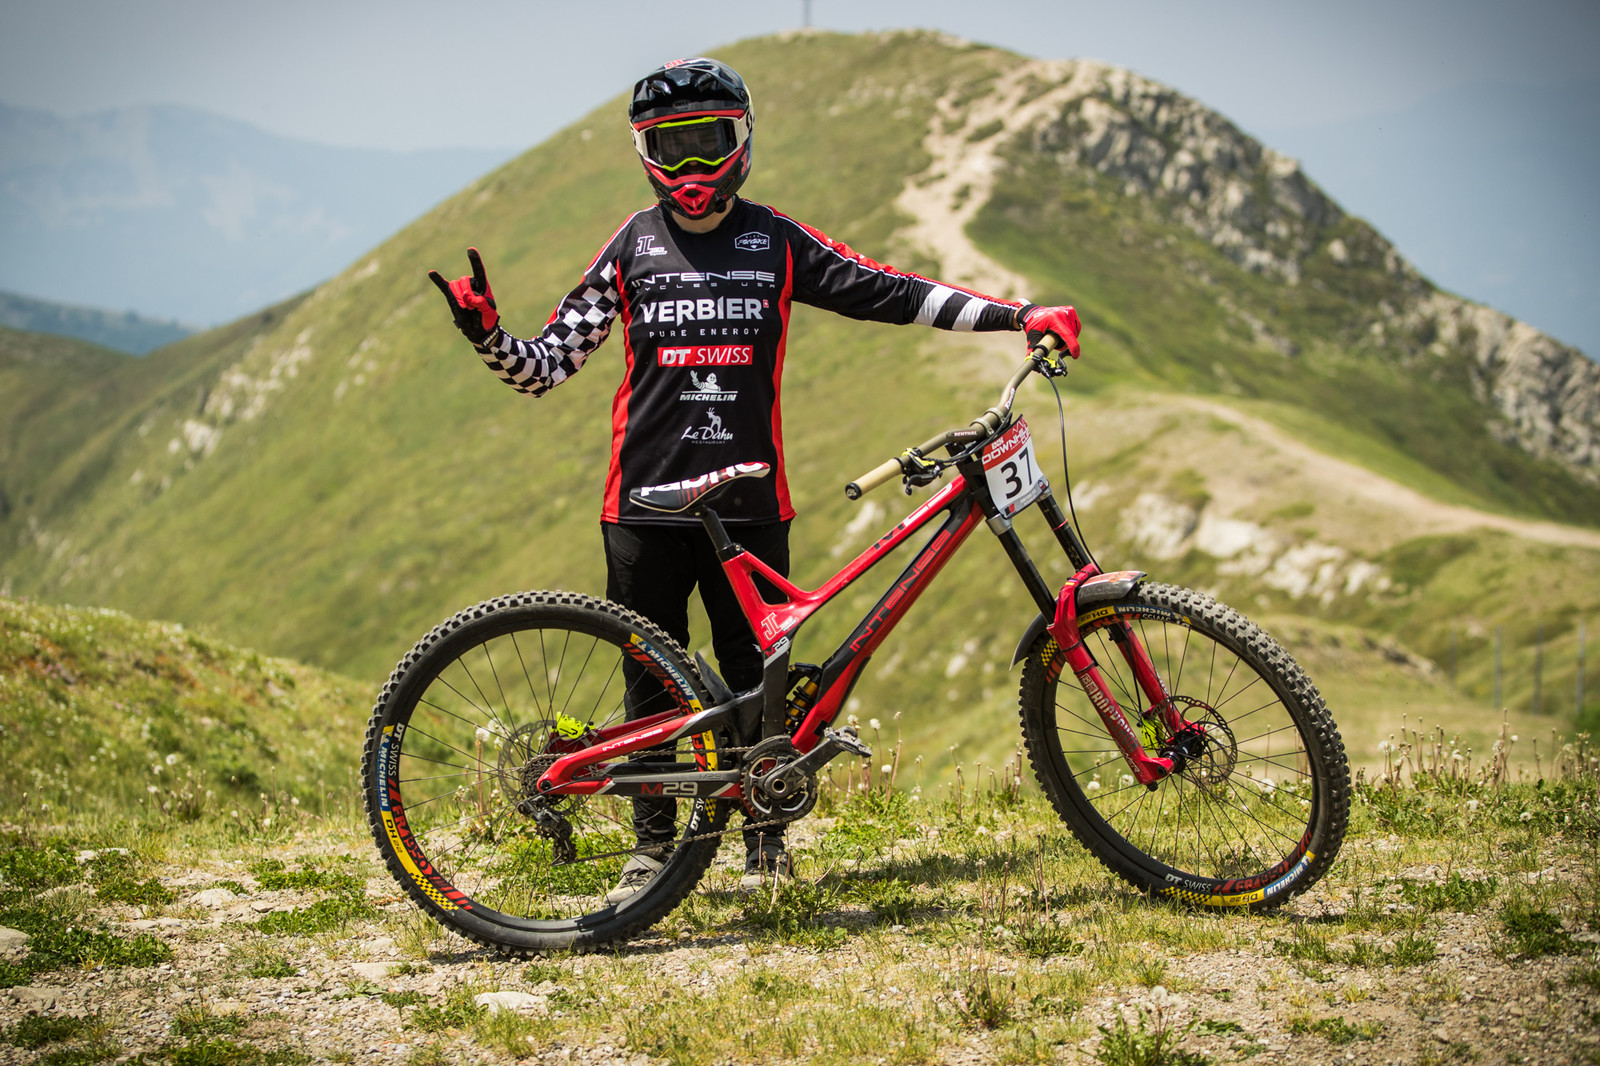 Loris Michellod of the JC Racing team and his Intense M29 - 25 Downhill Bikes - iXS DH Cup #3 - Abetone - Mountain Biking Pictures - Vital MTB